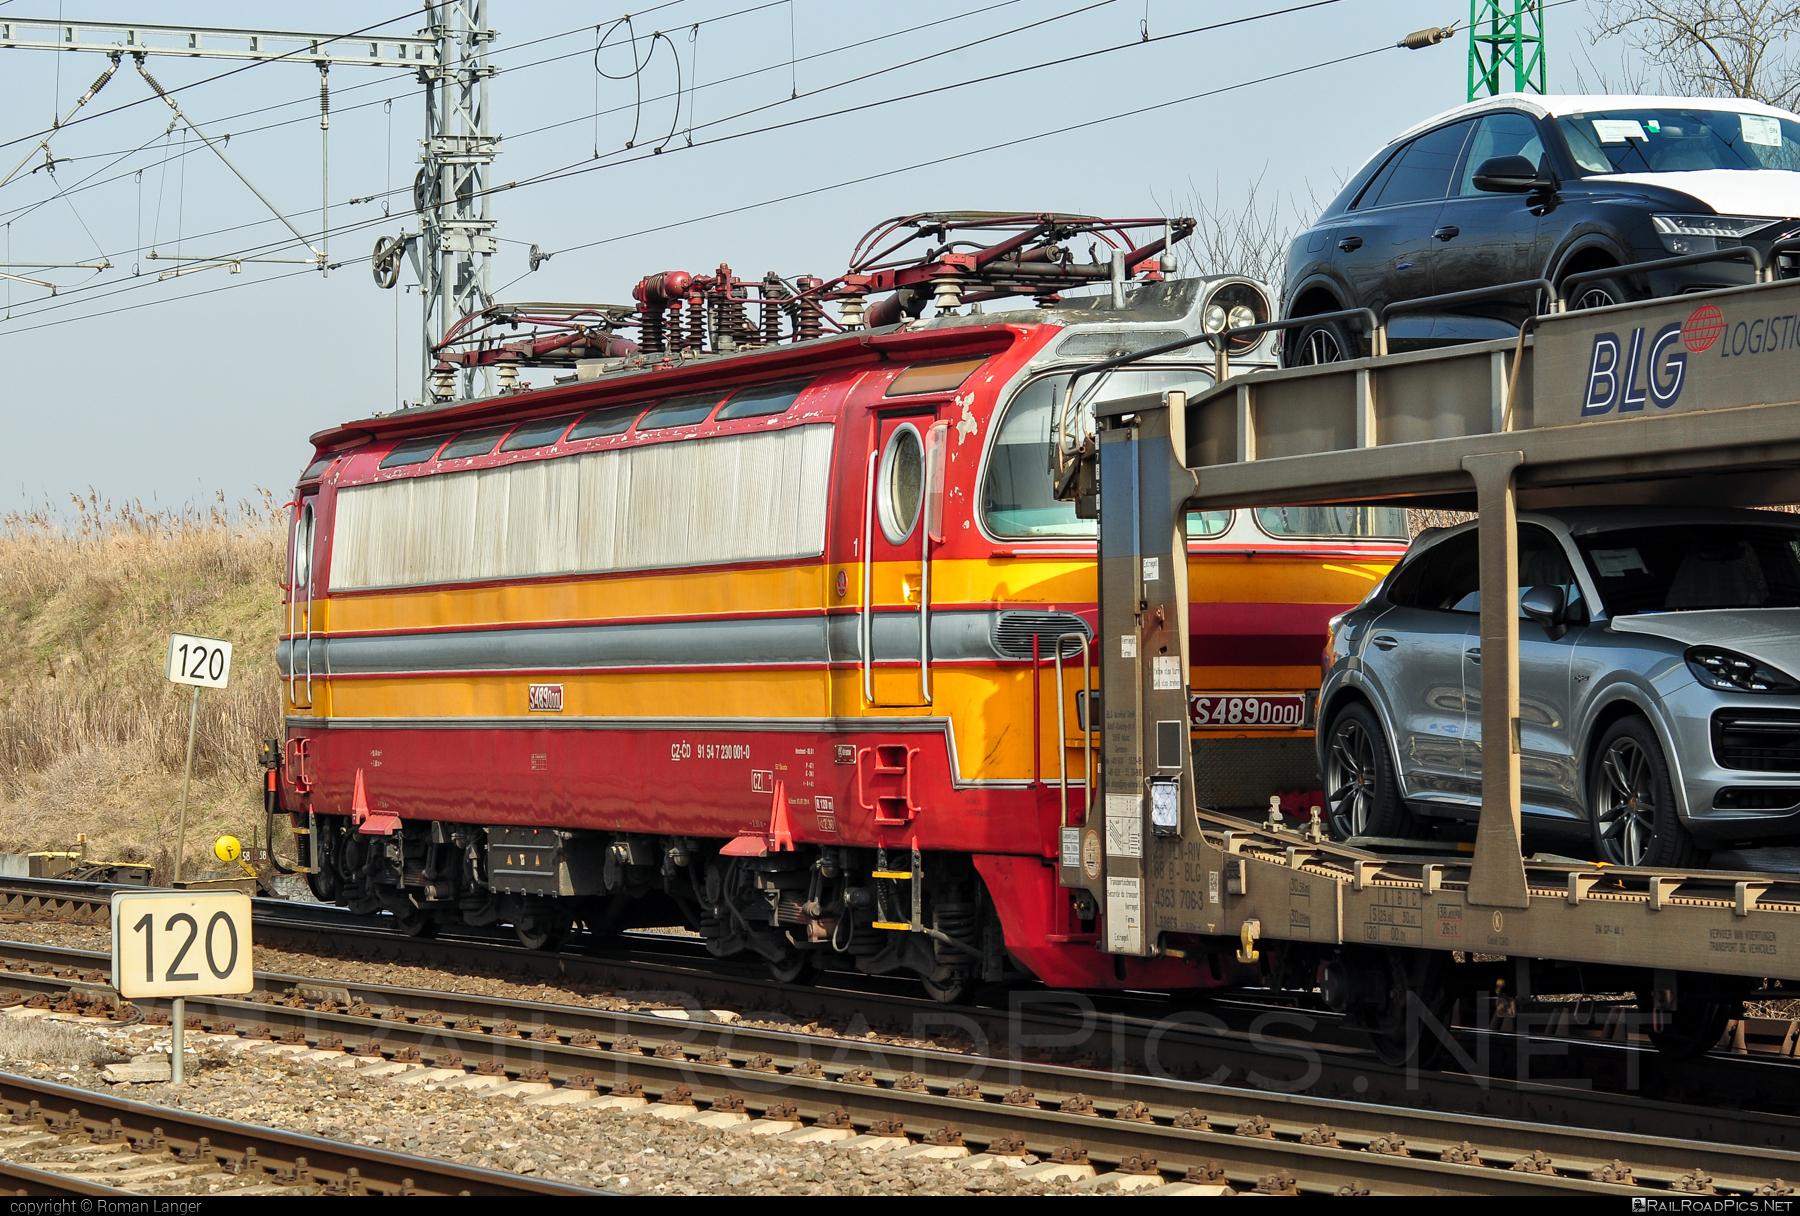 Škoda 47E - 230 001-0 operated by České dráhy, a.s. #carcarrierwagon #cartransportcarrier #ceskedrahy #laminatka #locomotive240 #skoda #skoda47e